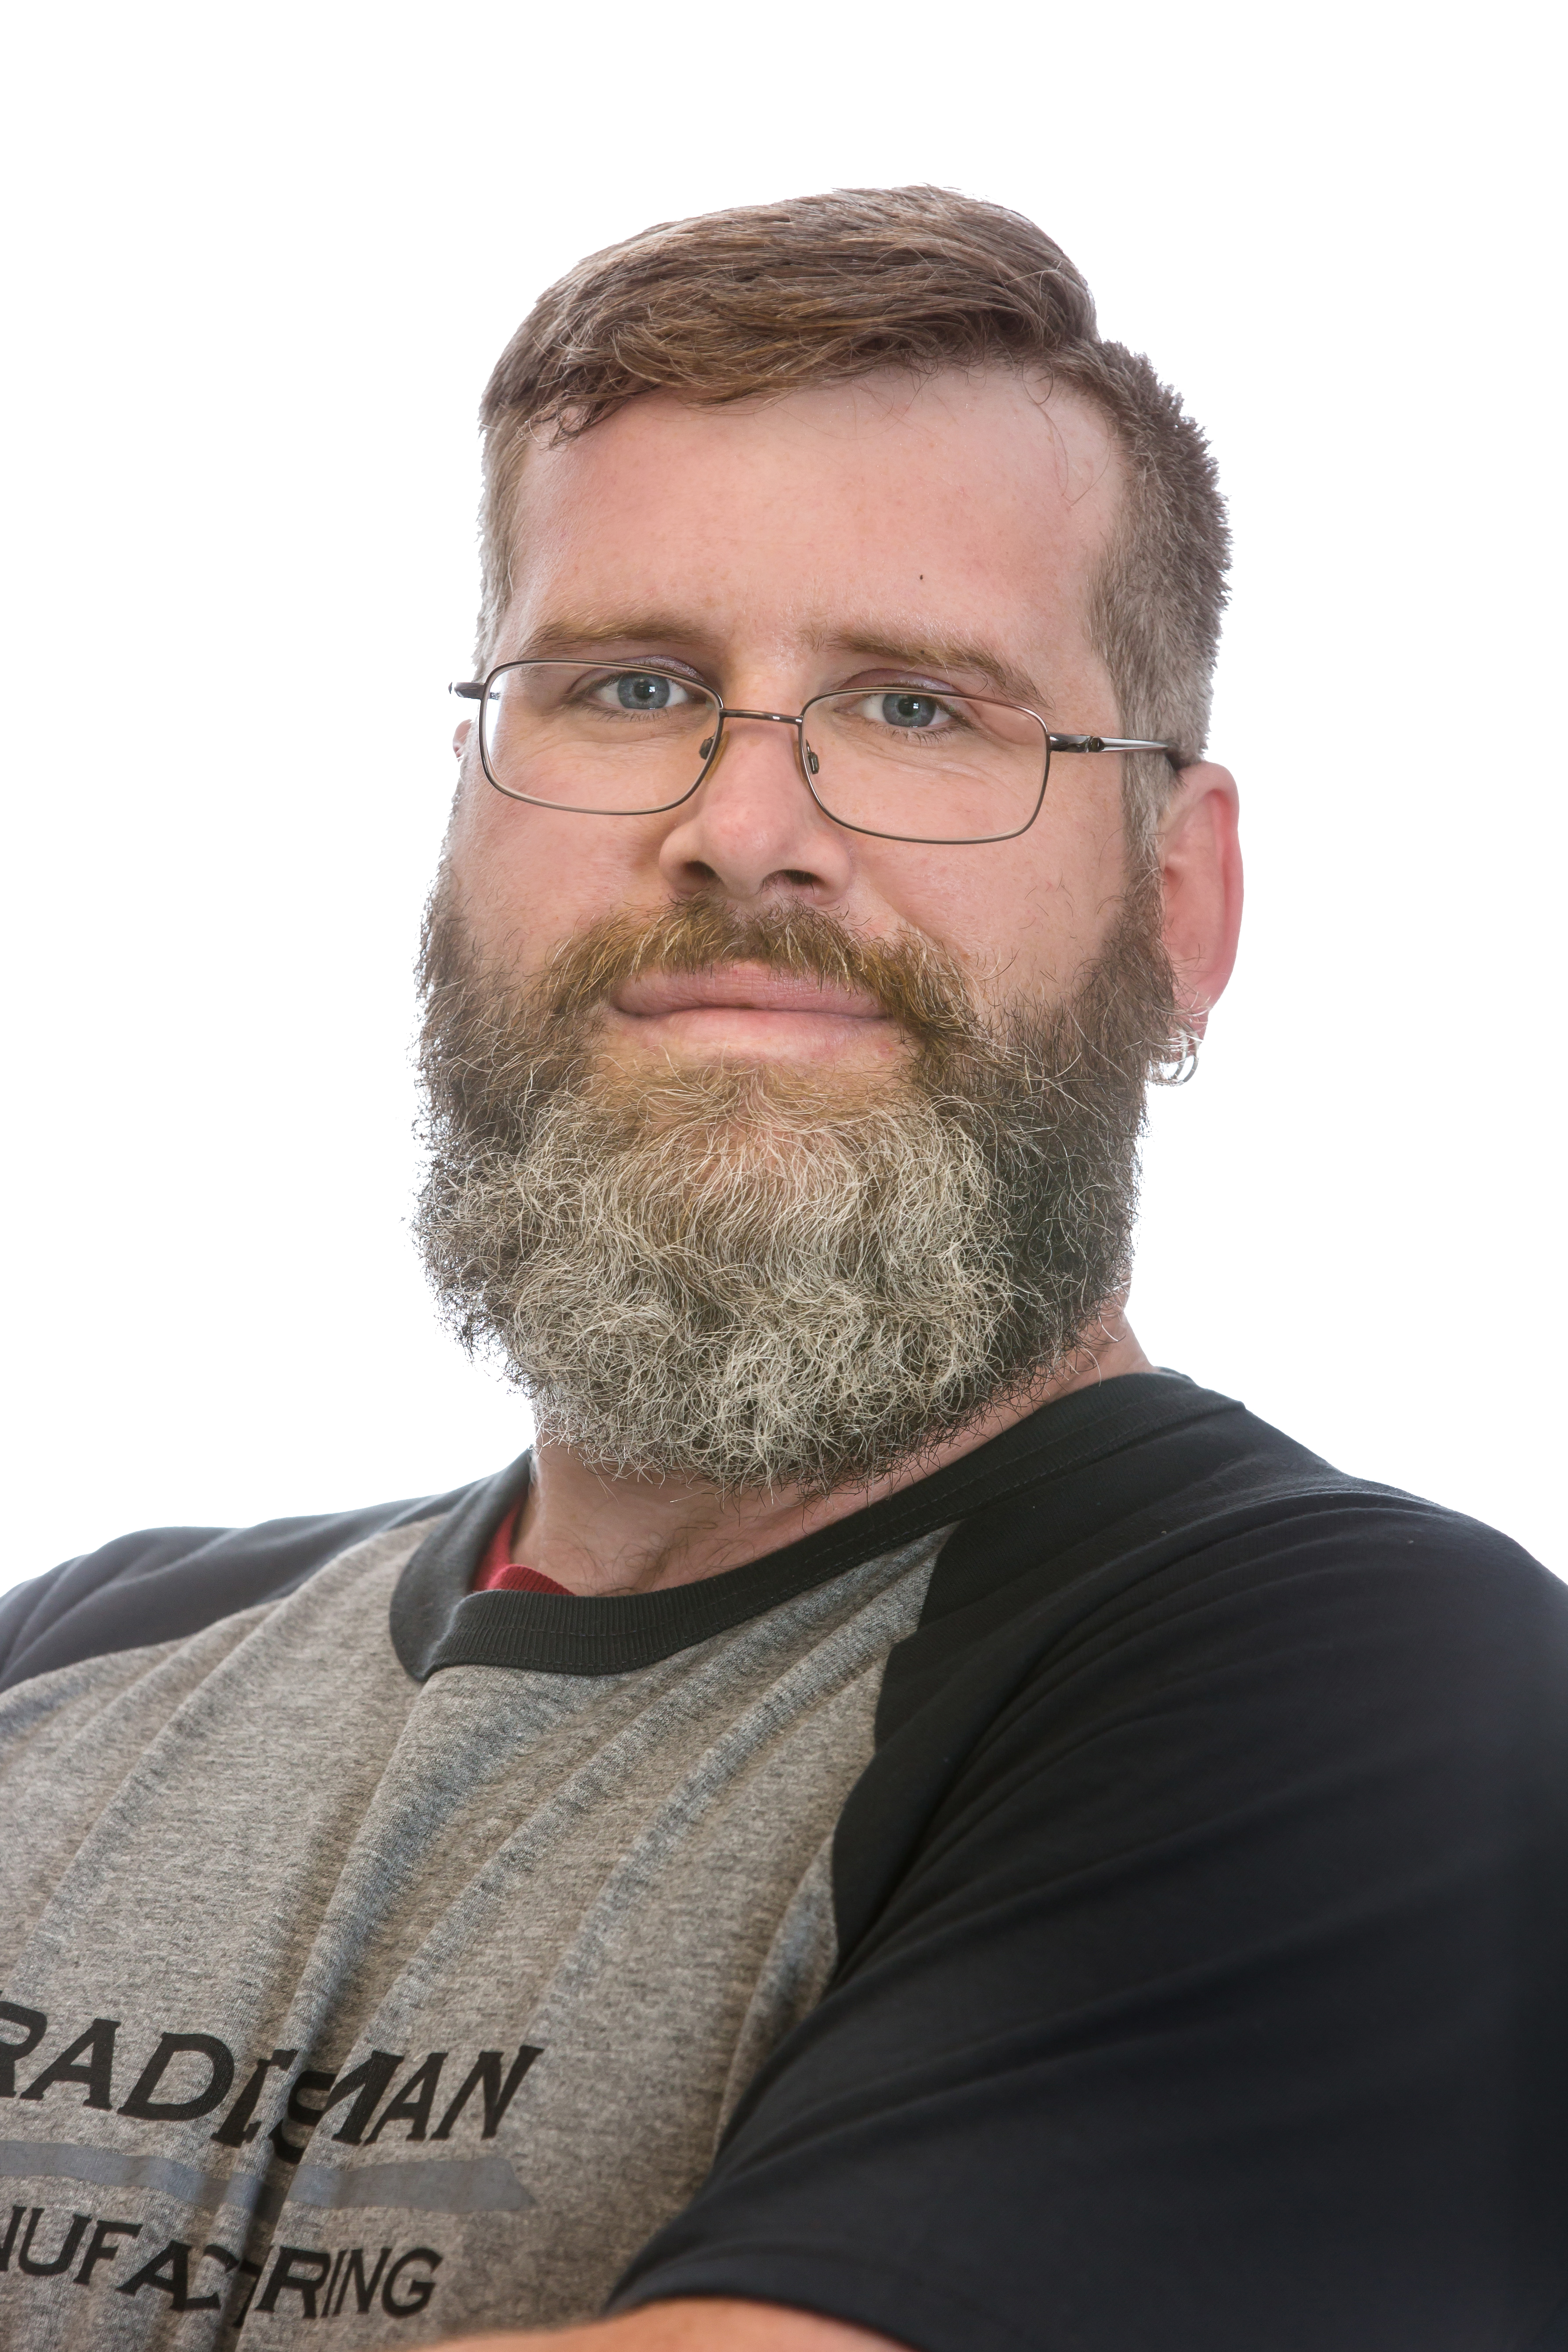 Rob Noordhof